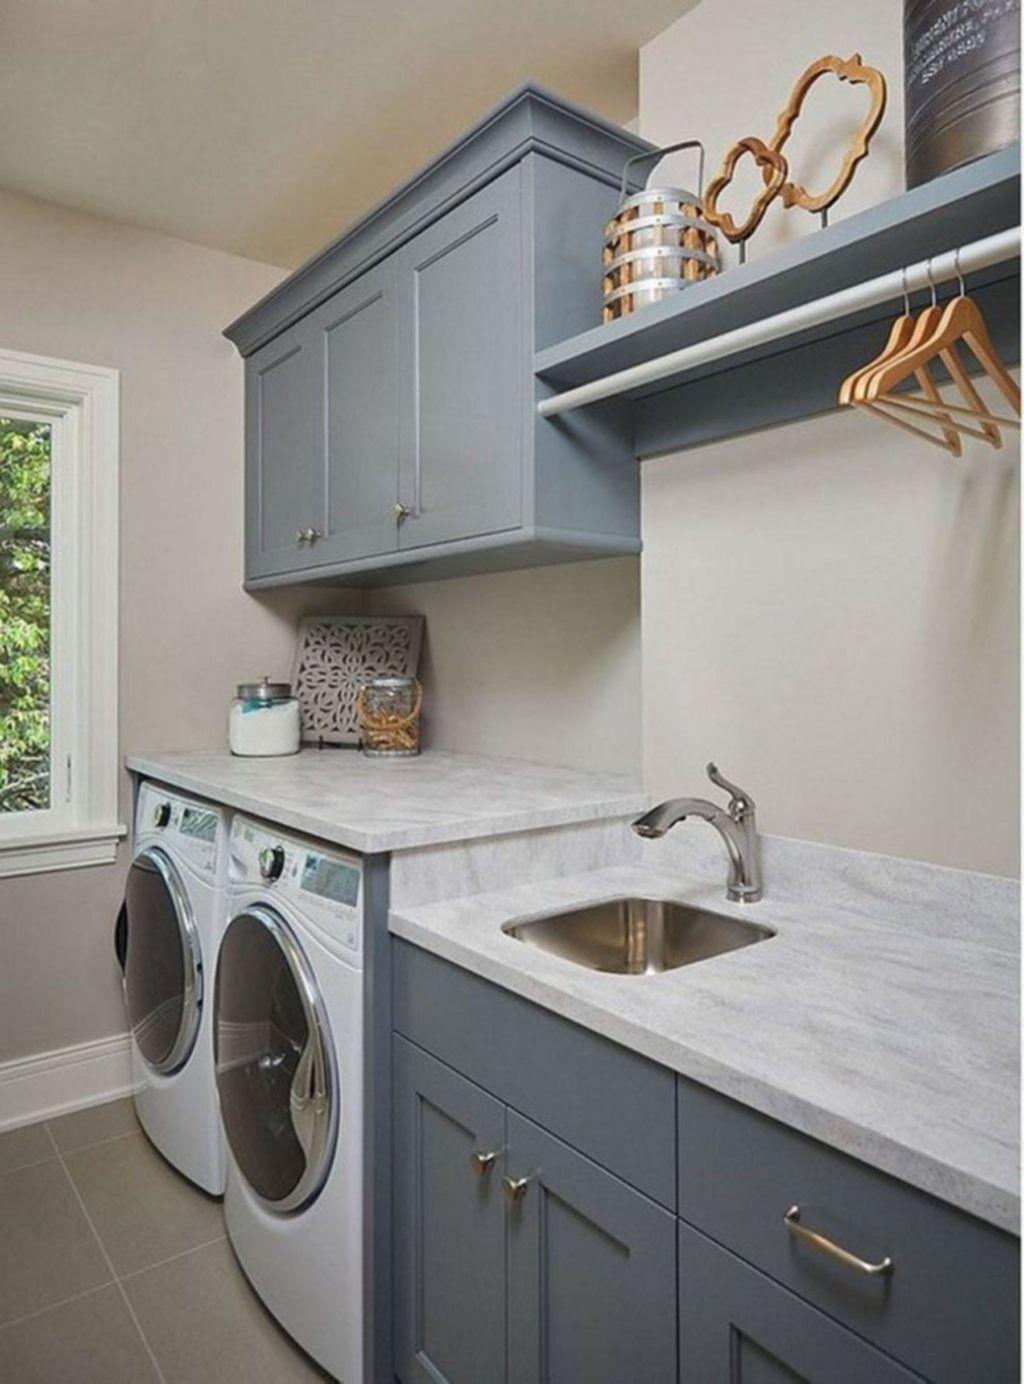 10x10 Laundry Room Layout: Inspiring Laundry Room Design Ideas